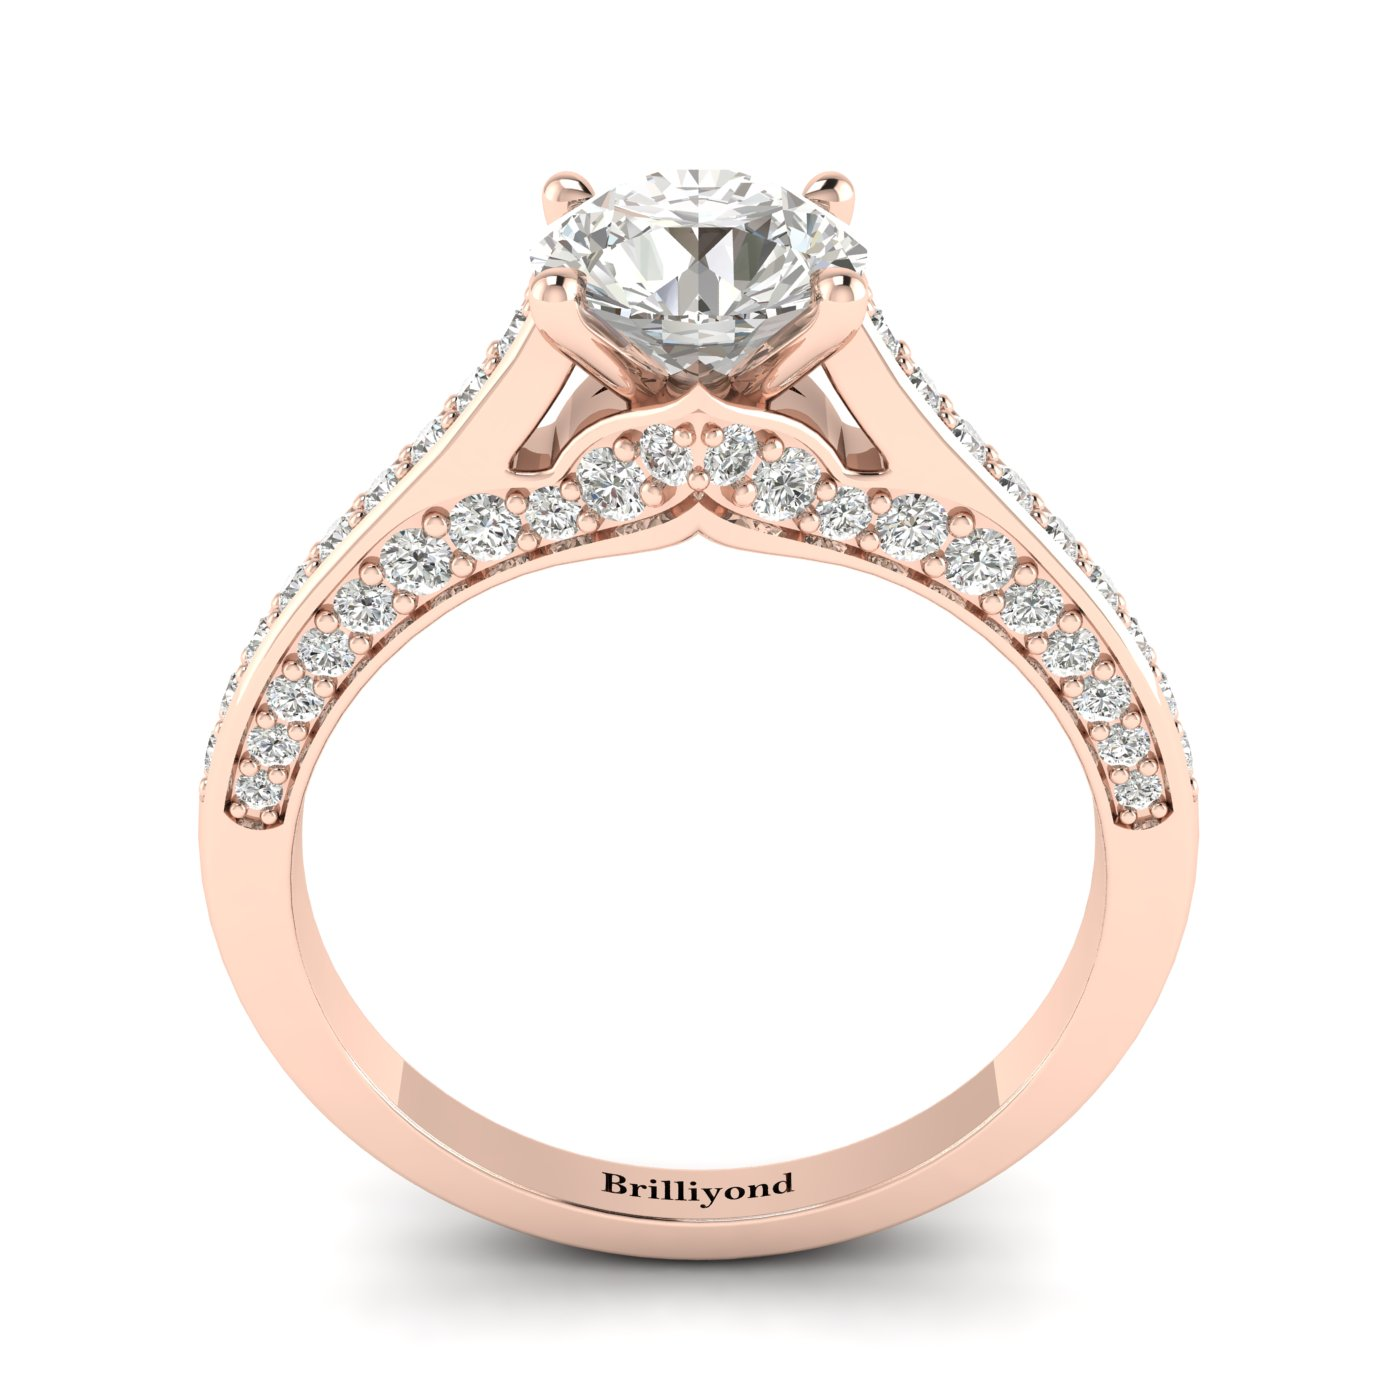 White Sapphire Rose Gold Brilliant Cut Engagement Ring Stargate_image1